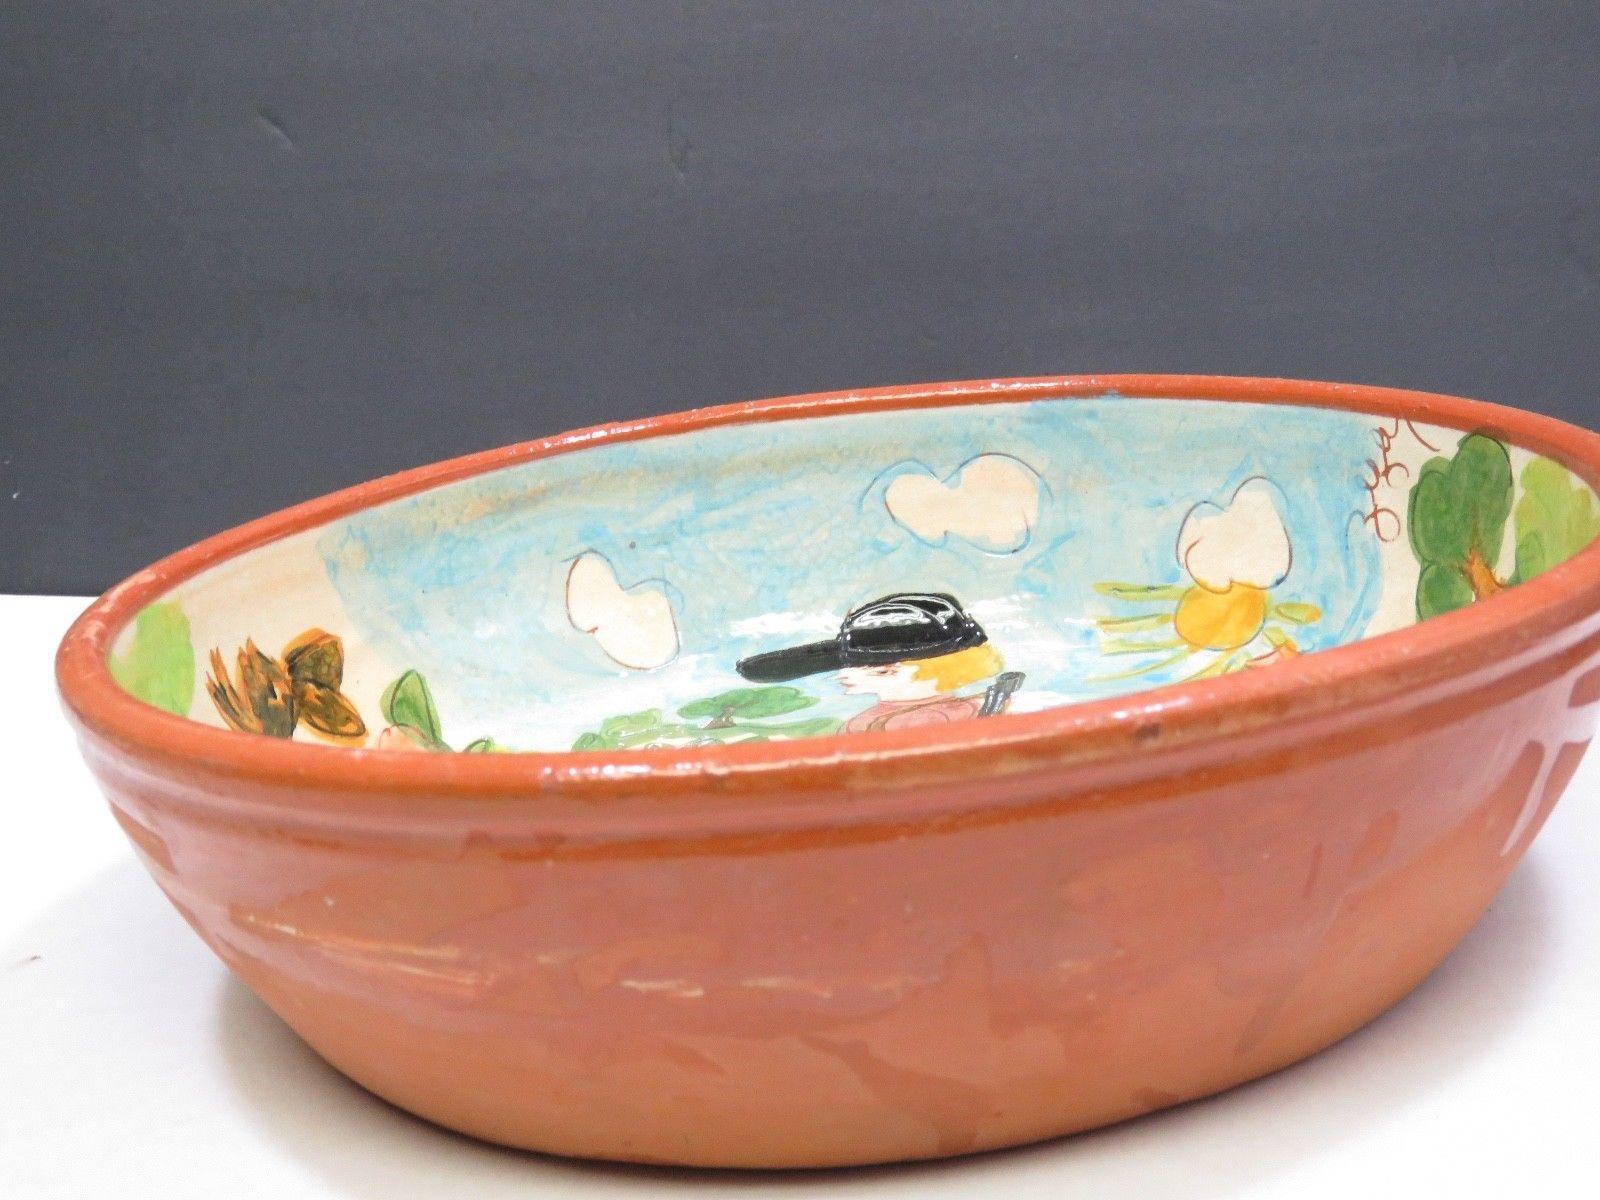 Maquevista Redondo Portugal Pottery Redware and 50 similar items